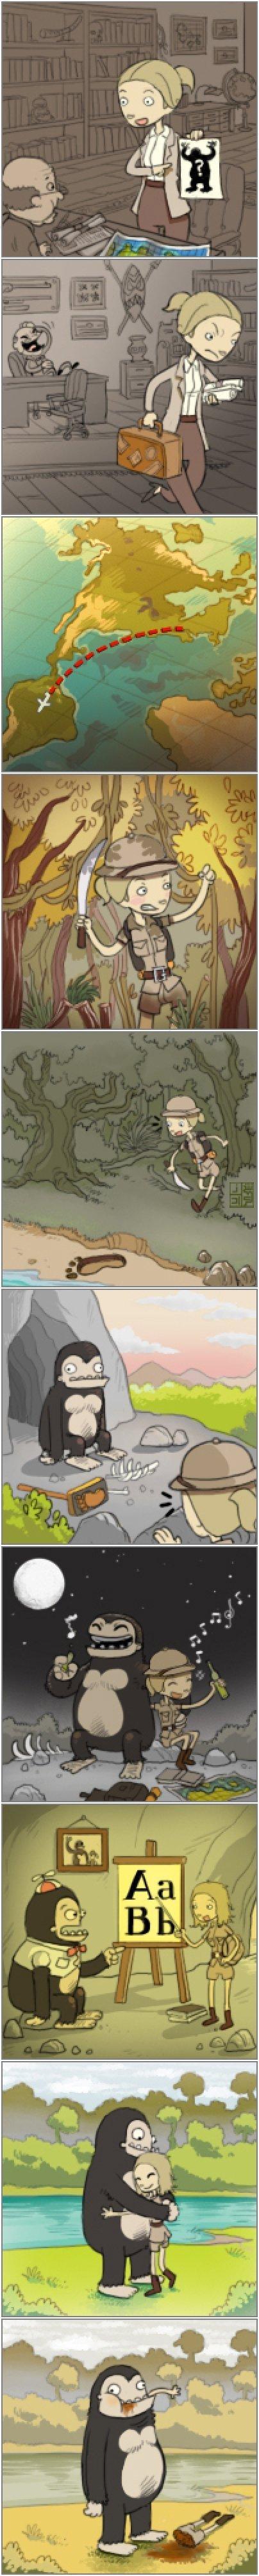 bigfoot is real. .